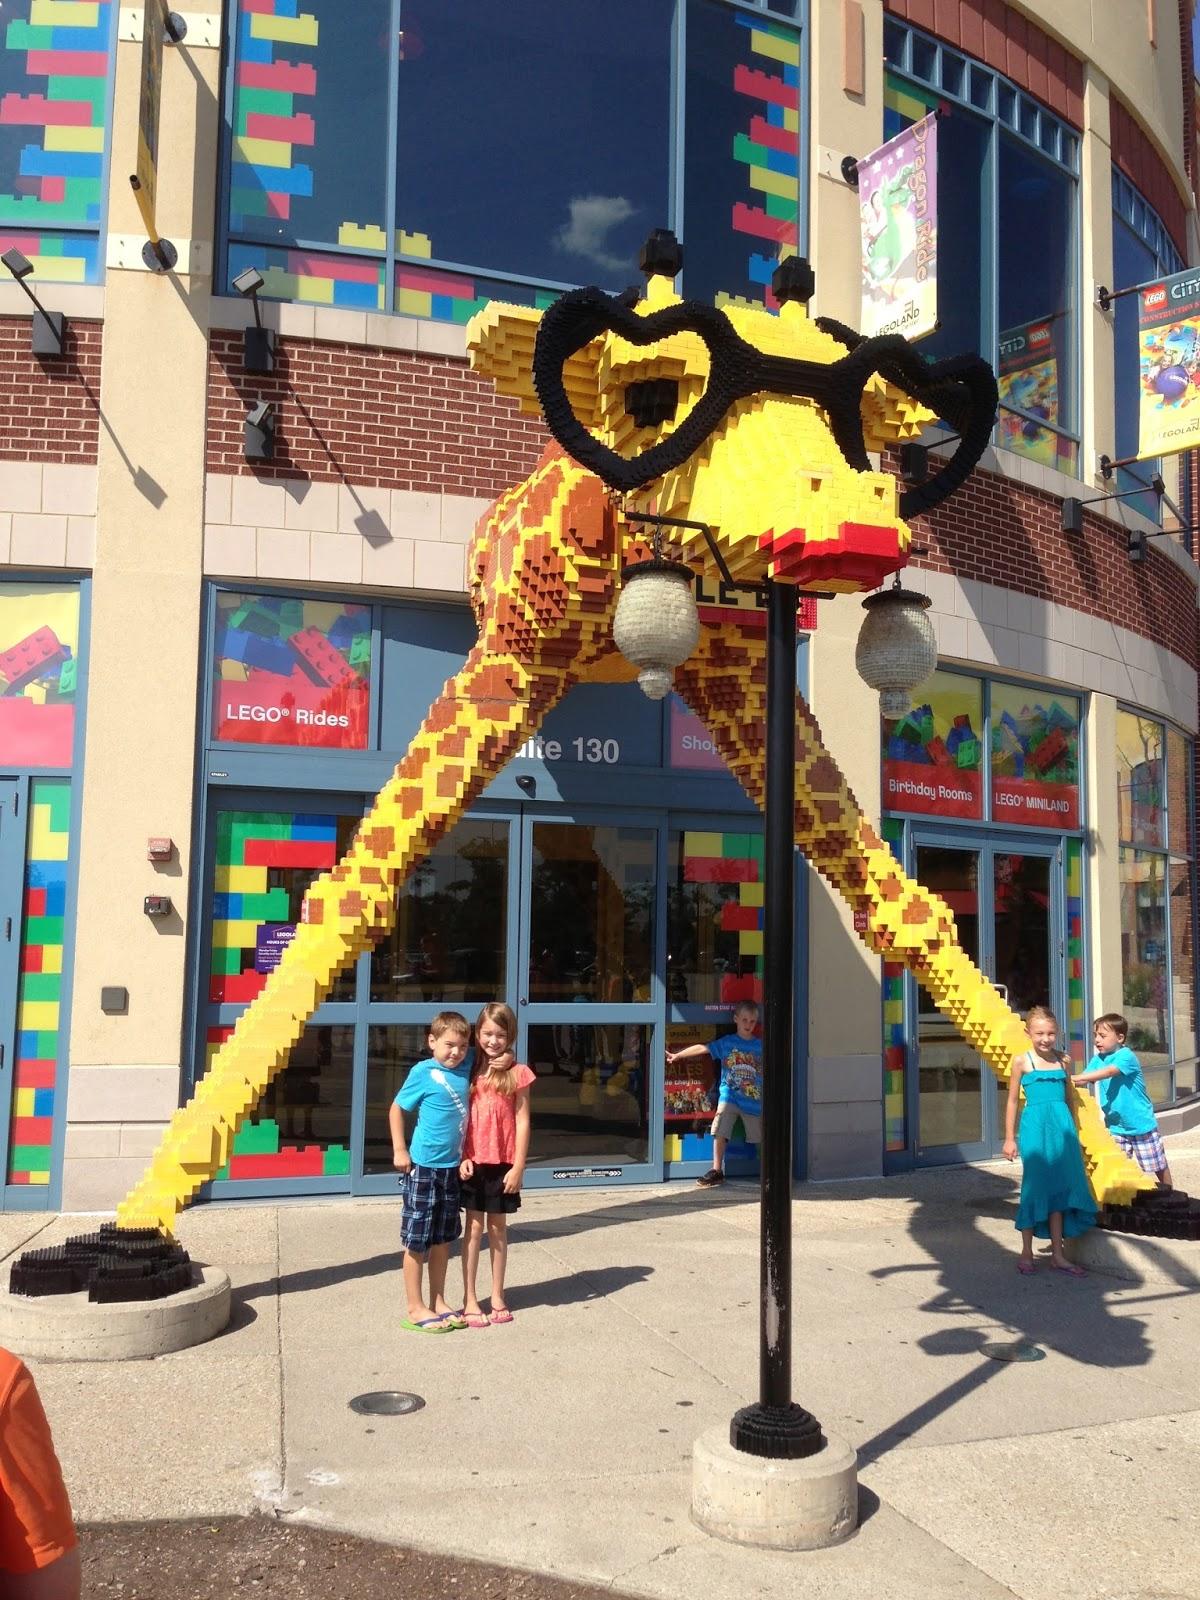 It's Fun 4 Me!: Legoland Discovery Center: Chicago, Illinios